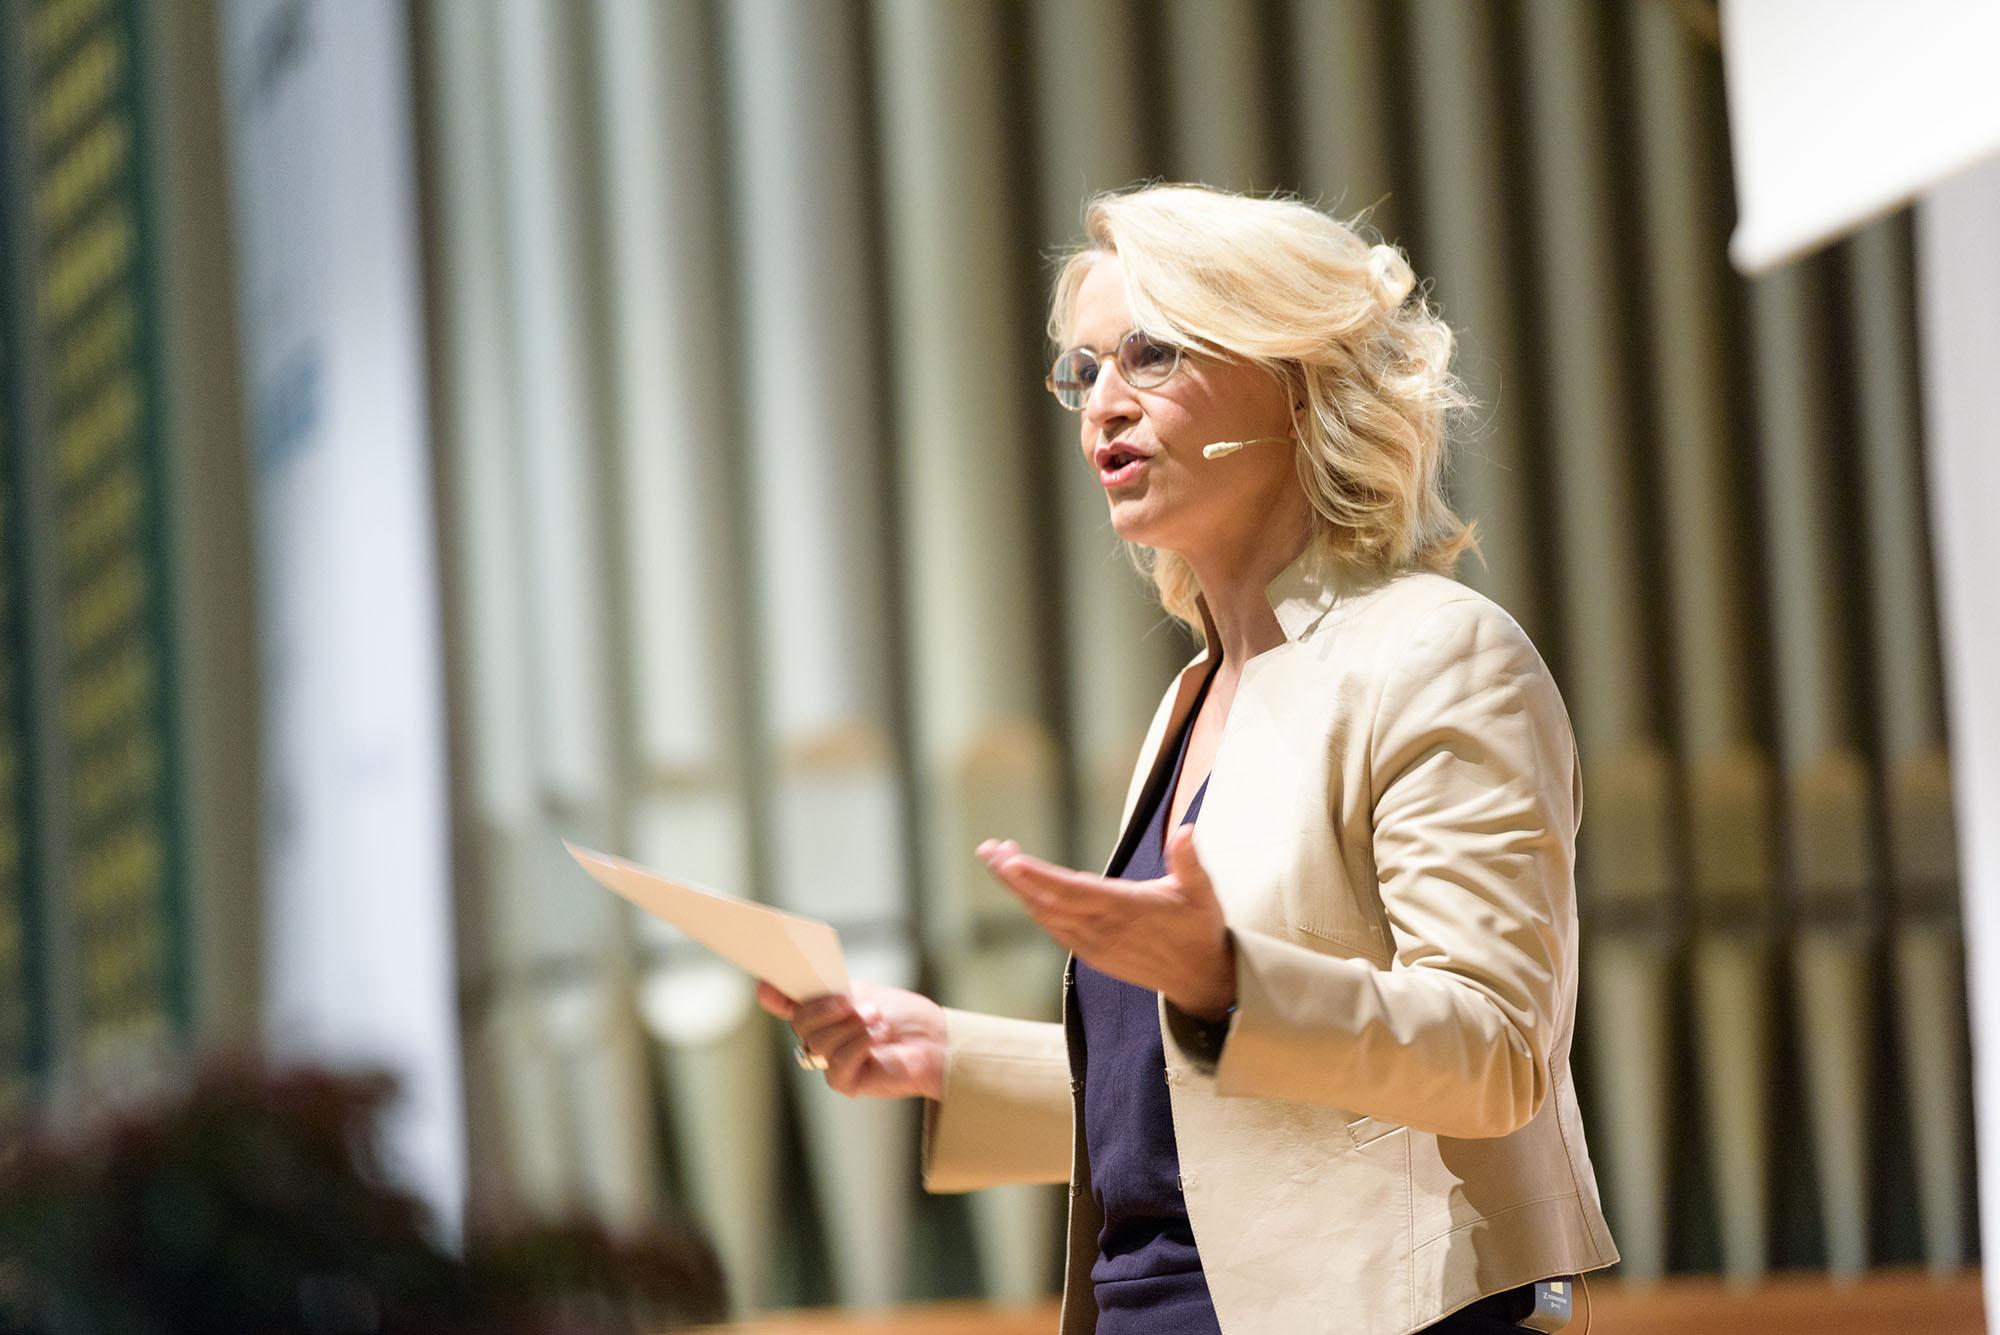 Sonja Hasler, Moderatorin und Redaktorin, SRF